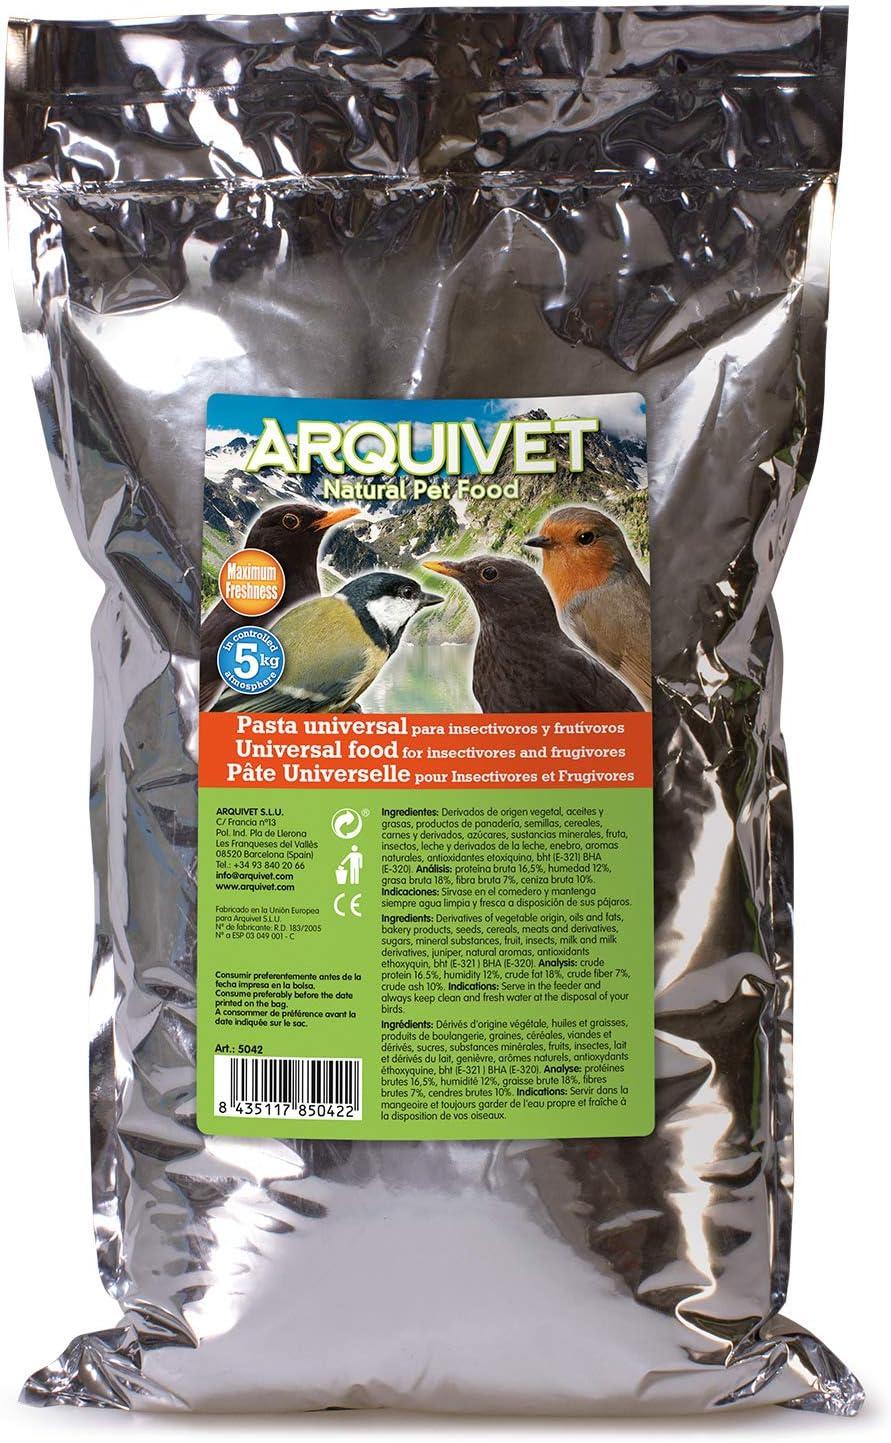 Arquivet Pasta Universal para insectívoros y frutívoros 5 kg - 5000 gr